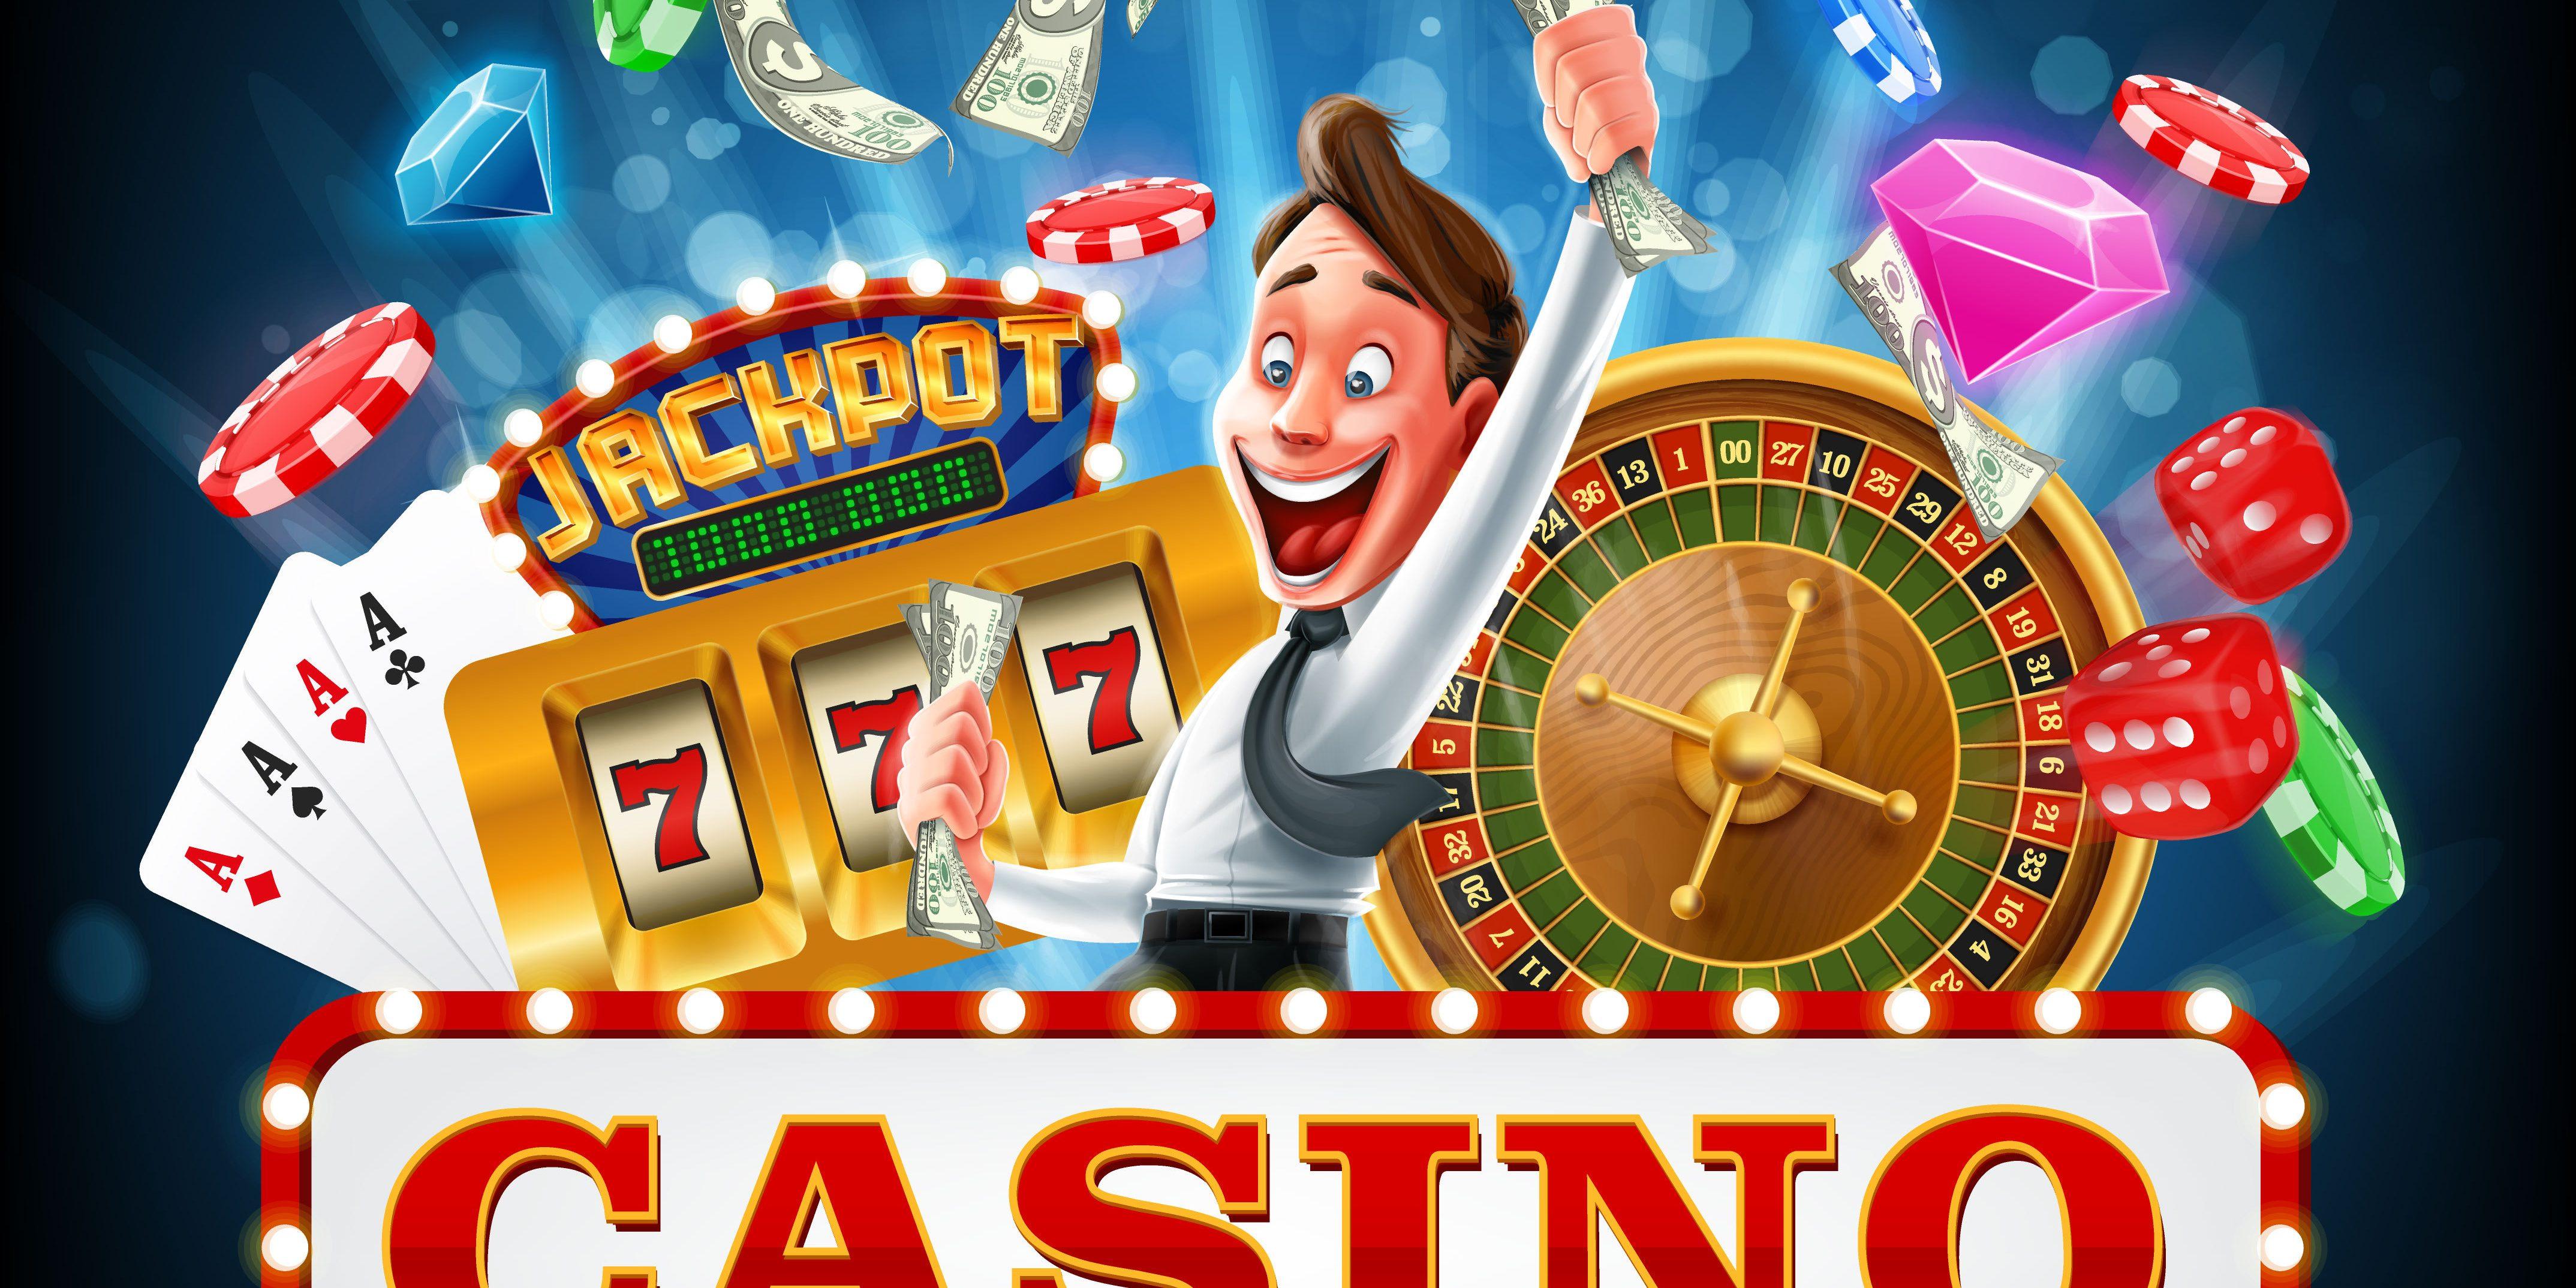 Minimum deposit / / 5 to play slots at online casinos